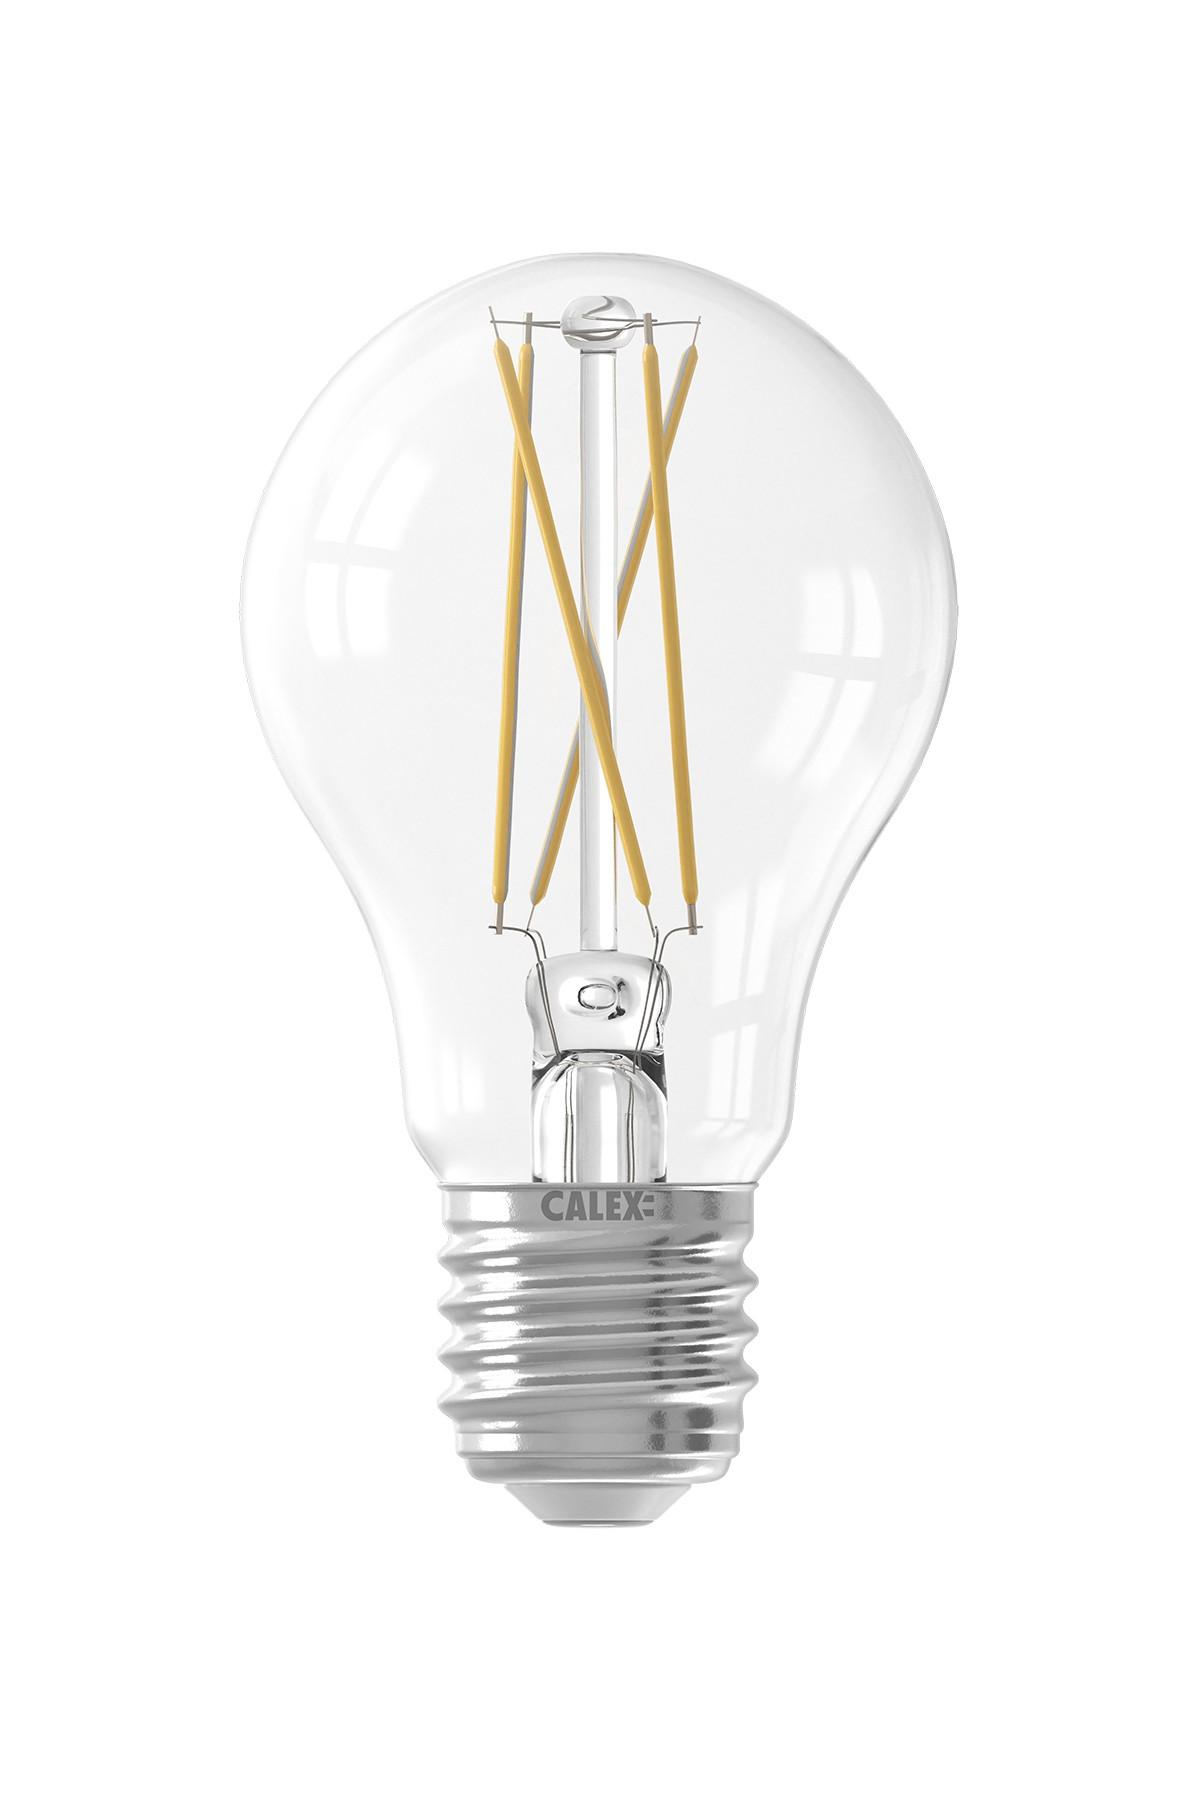 Calex Smart Standaard led lamp 7W 806lm 1800-3000K